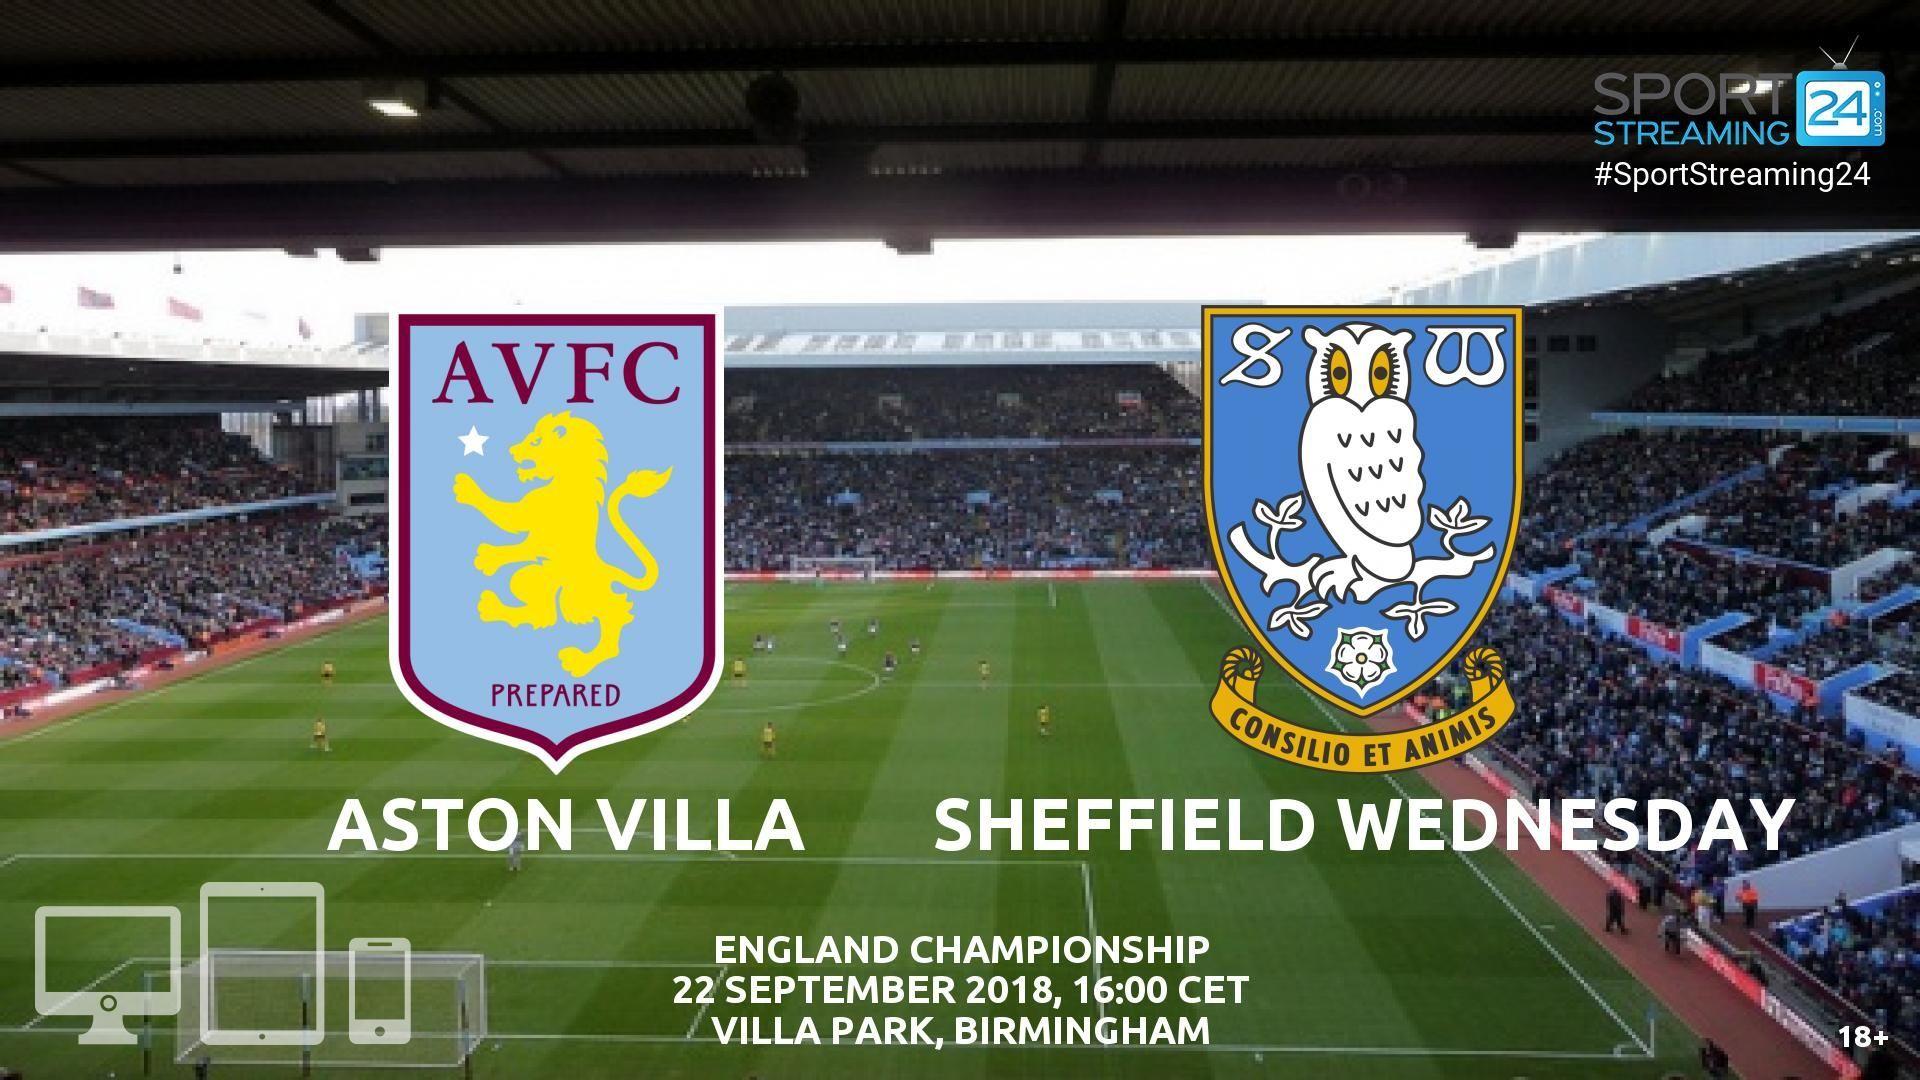 Aston Villa V Sheff Wed Live Streaming Football Aston Villa Streaming Live Streaming